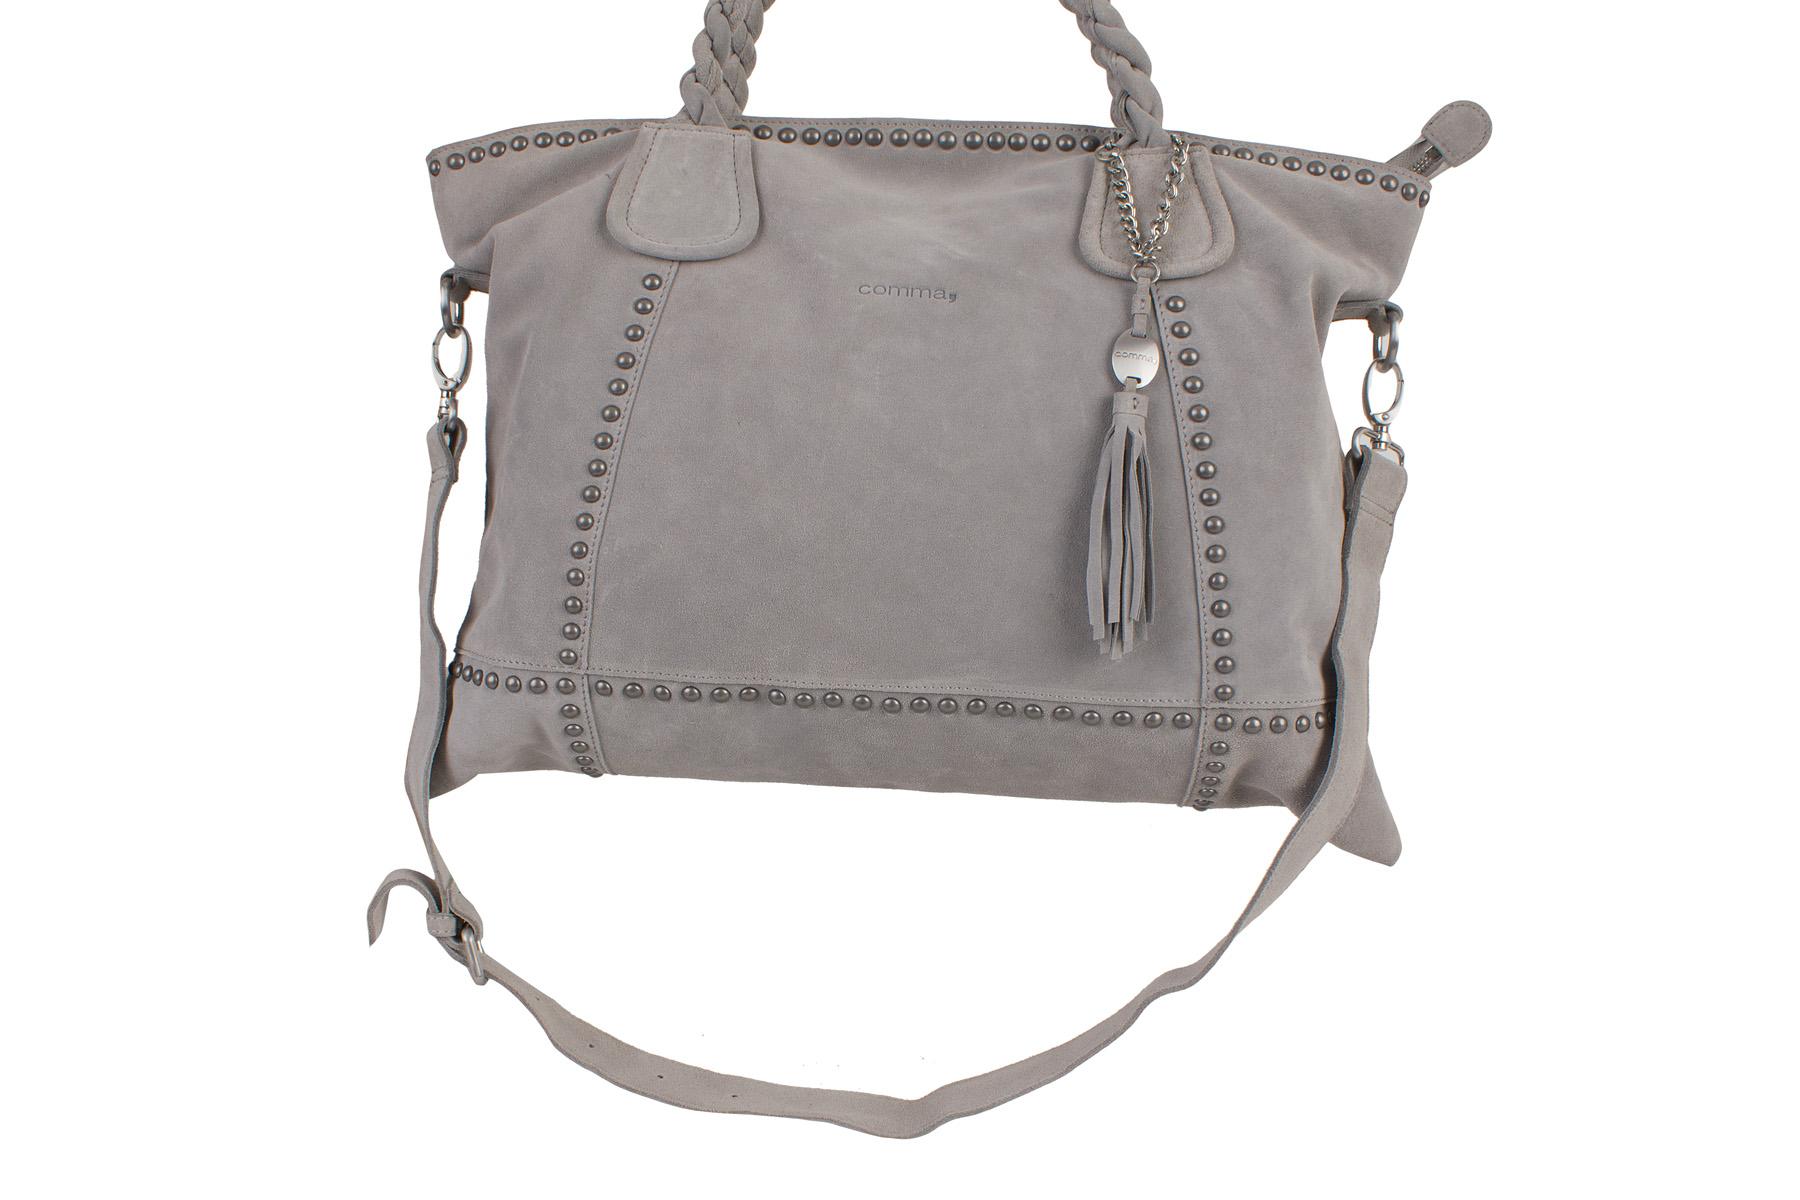 oliver bags damen shopper tasche grau smoked pearl grey 10. Black Bedroom Furniture Sets. Home Design Ideas